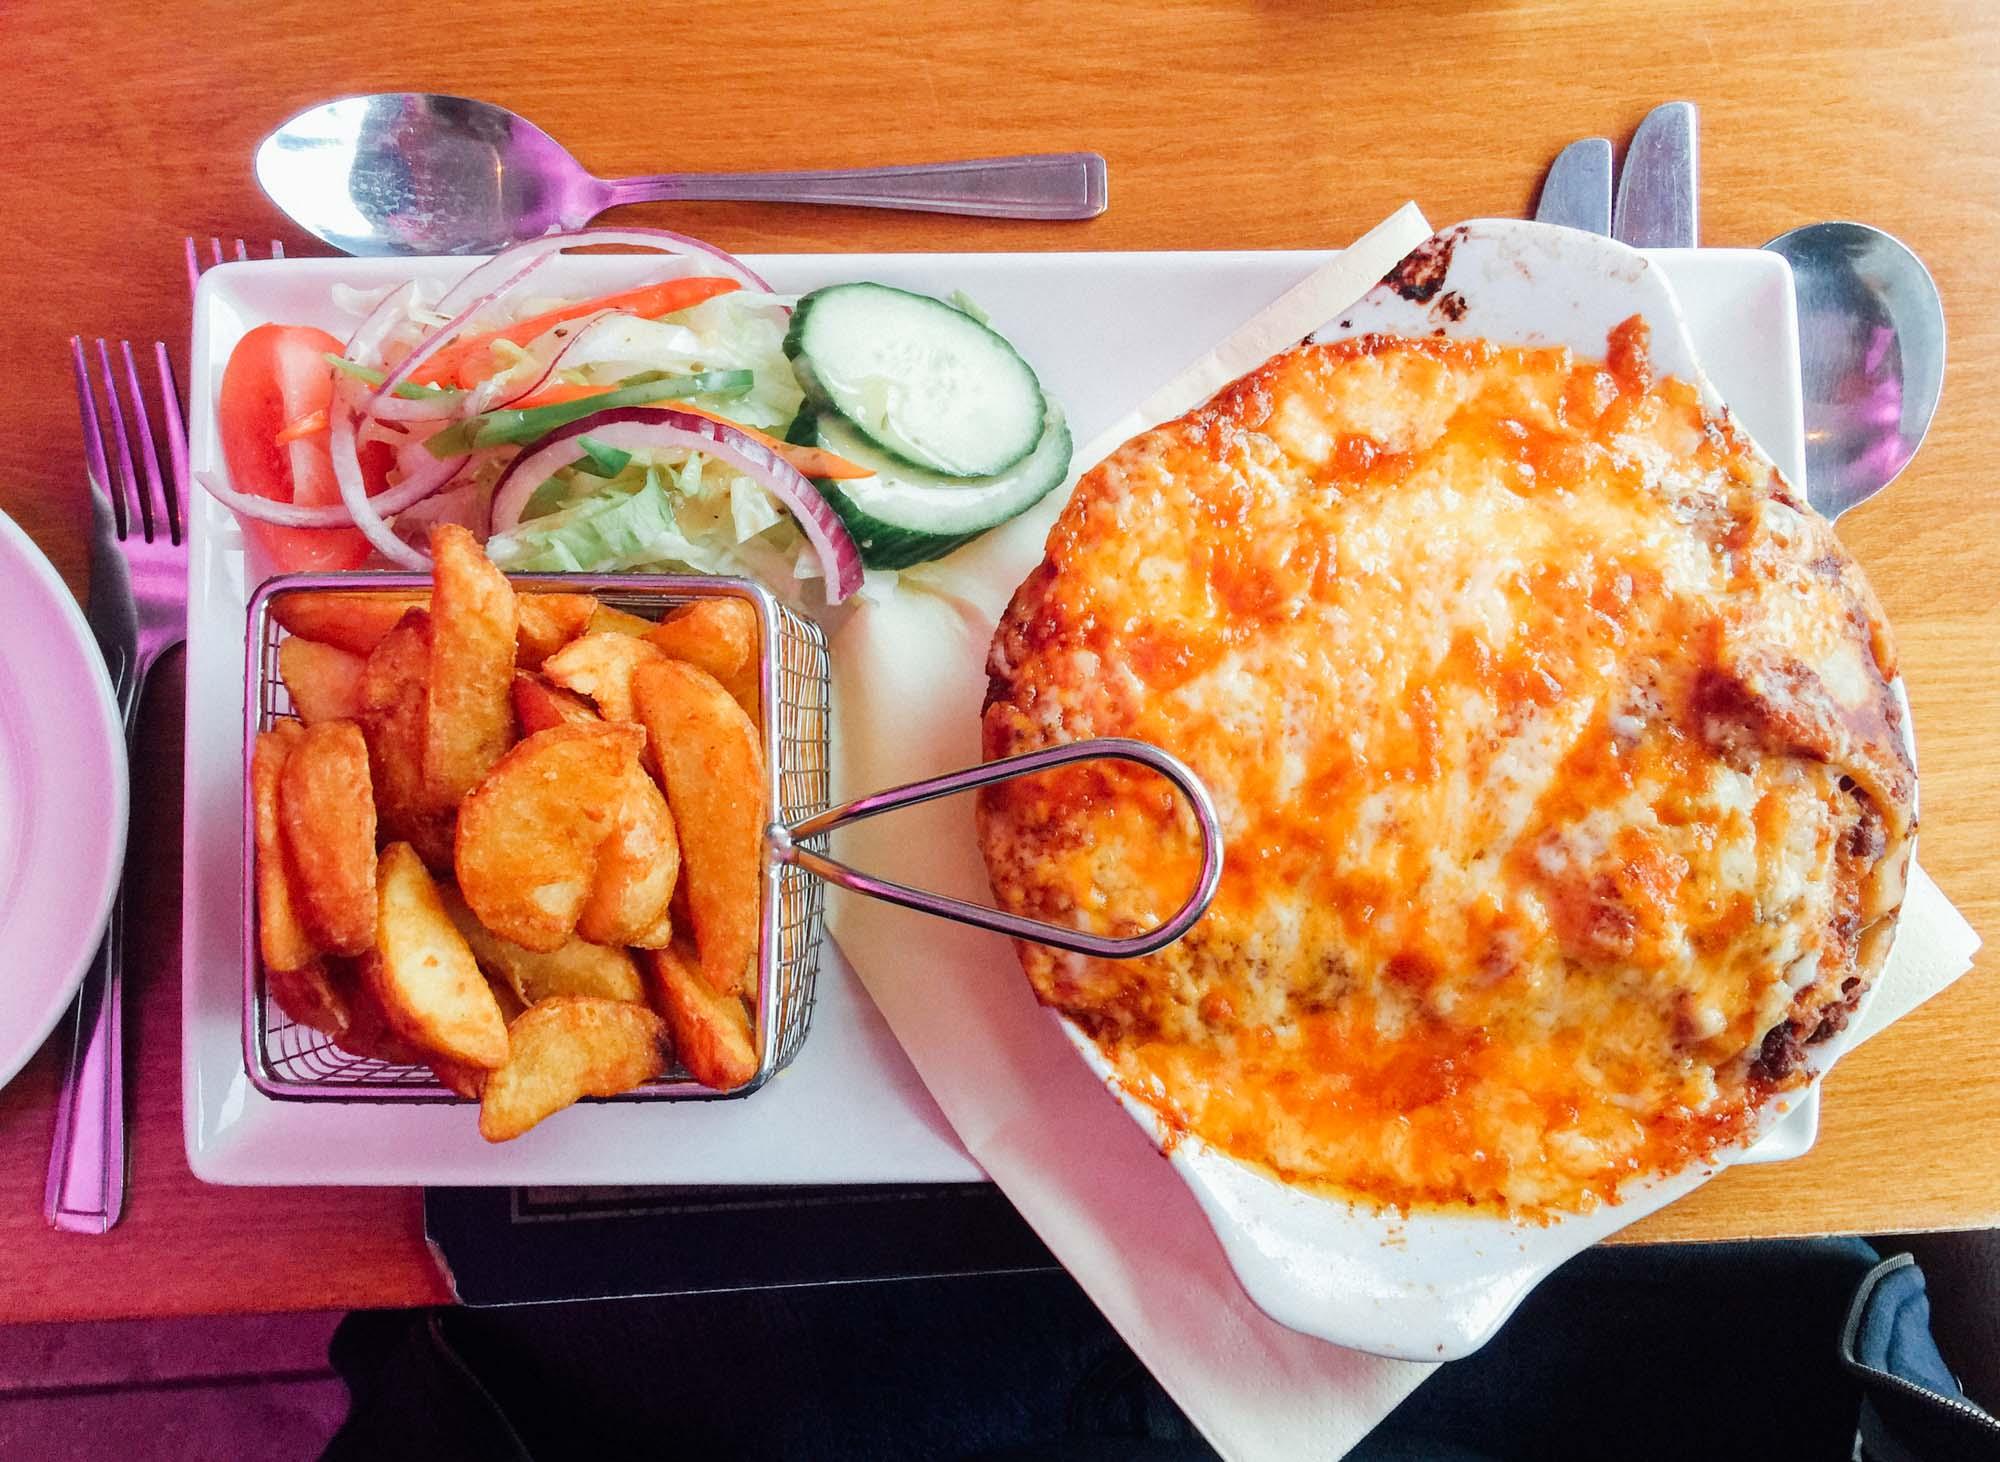 Food at the Ardlui Hotel